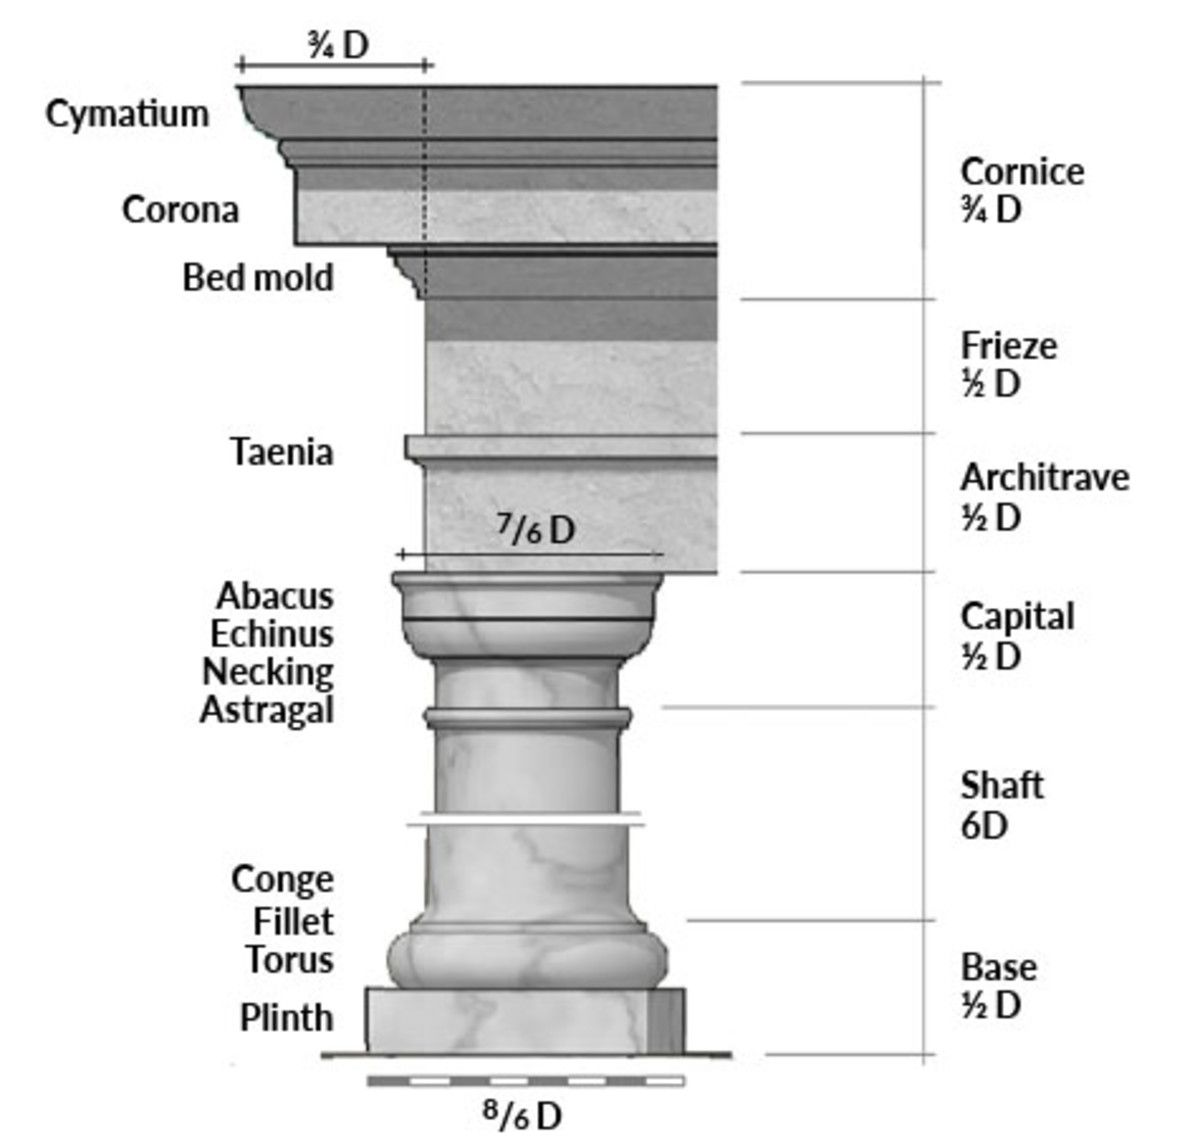 Parts Of A Cornice Google Search Tuscan Column Cornice Design Tuscan Architecture